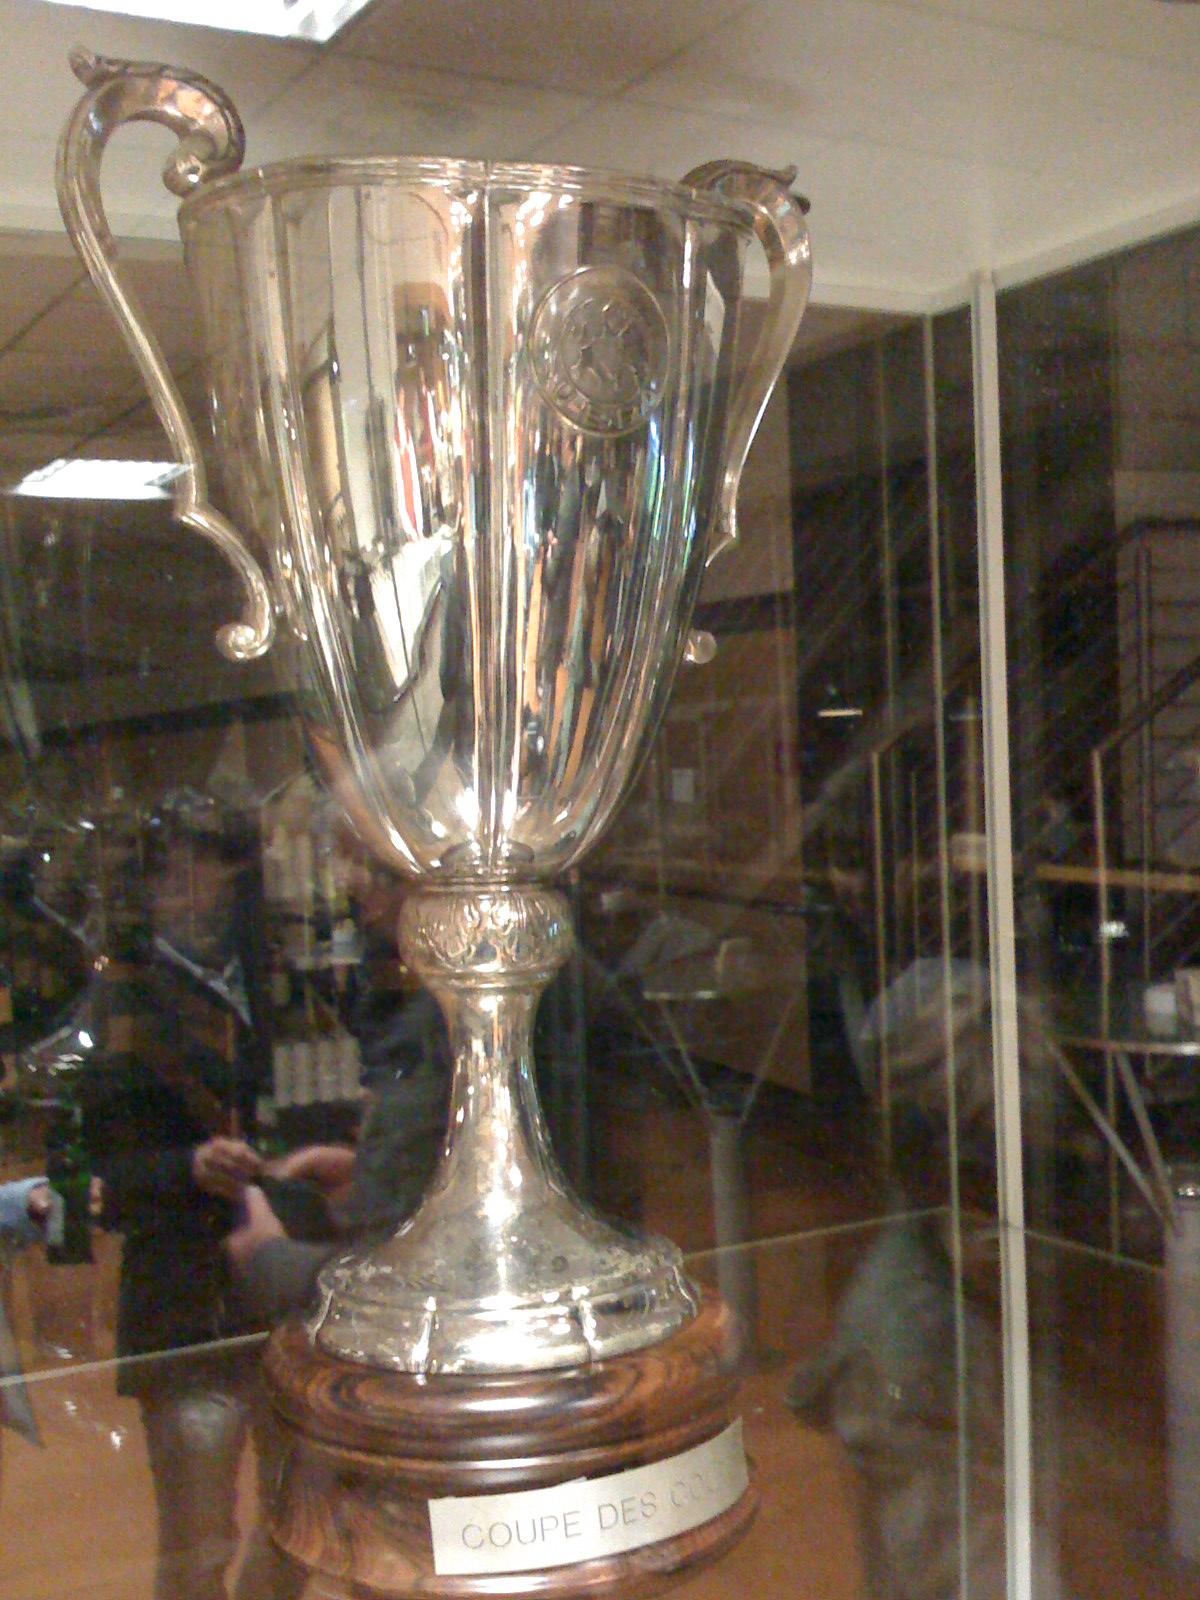 Картинки по запросу Кубок обладателей кубков УЕФА картинки